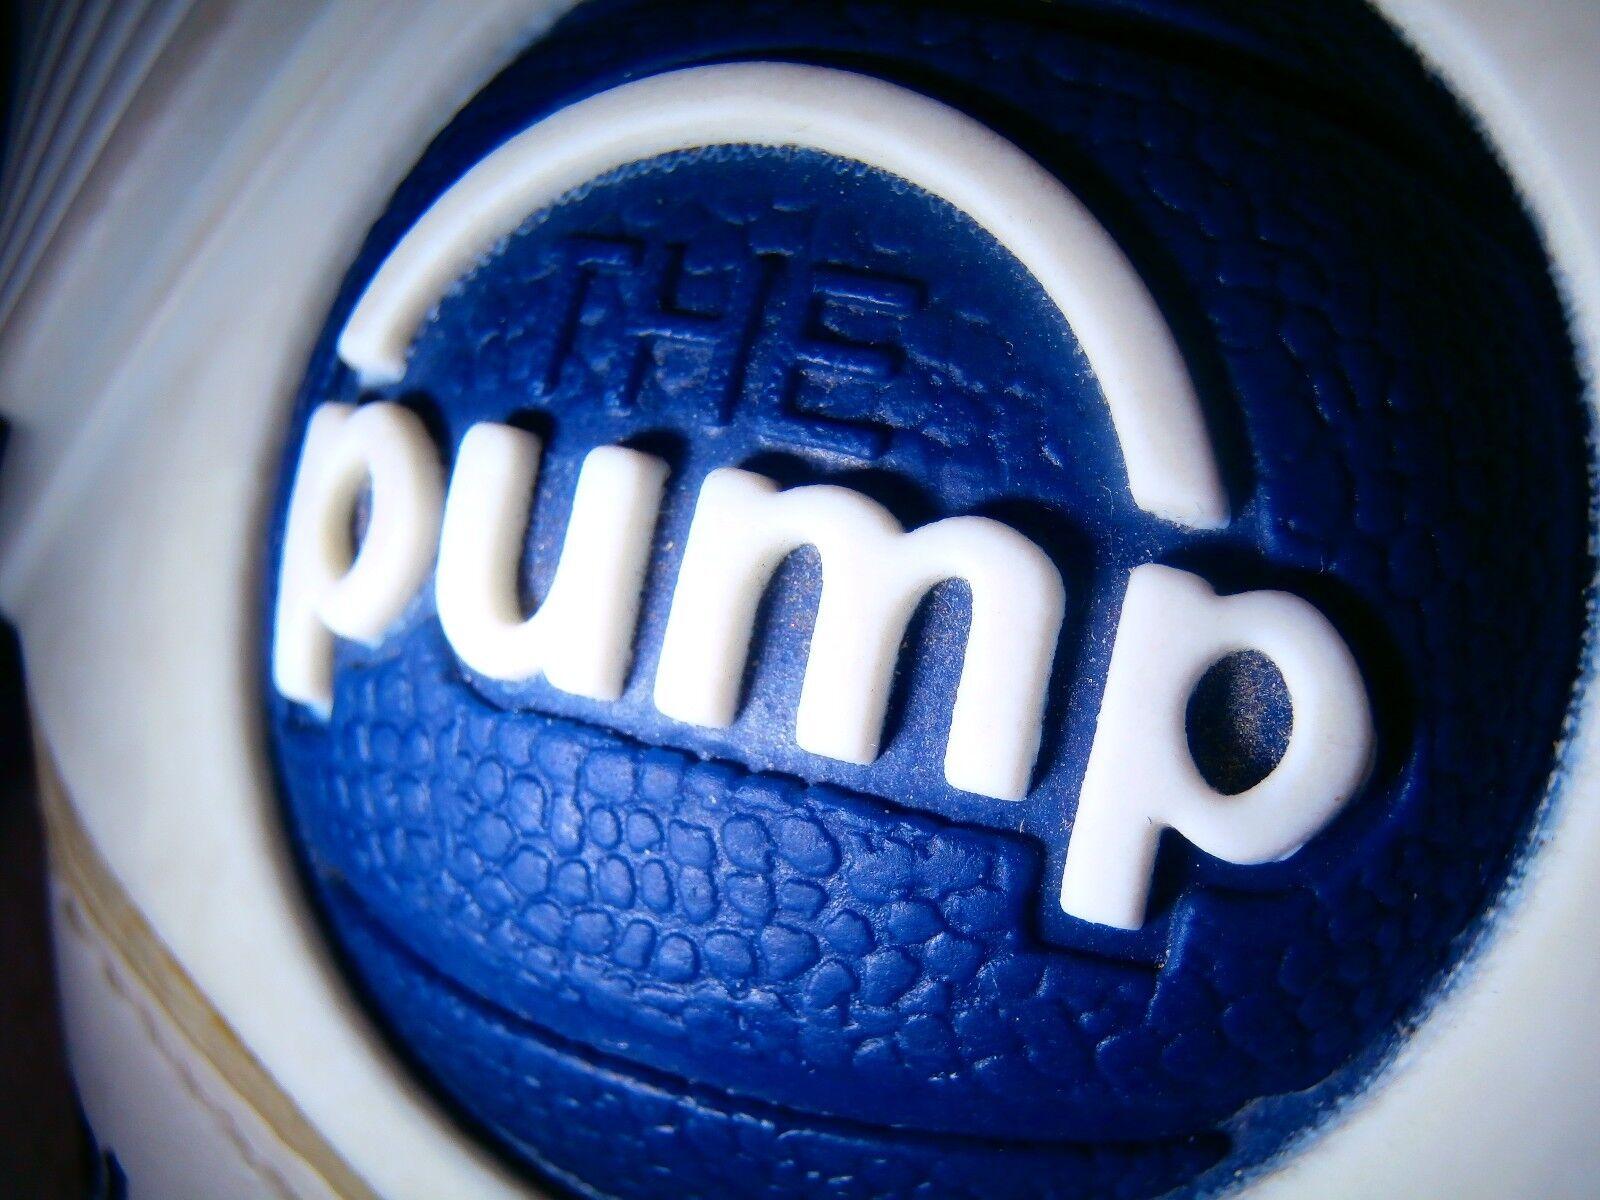 Reebok Pump Bringback BATTLEGROUND the pump certified Shaq Iverson BLACKTOP